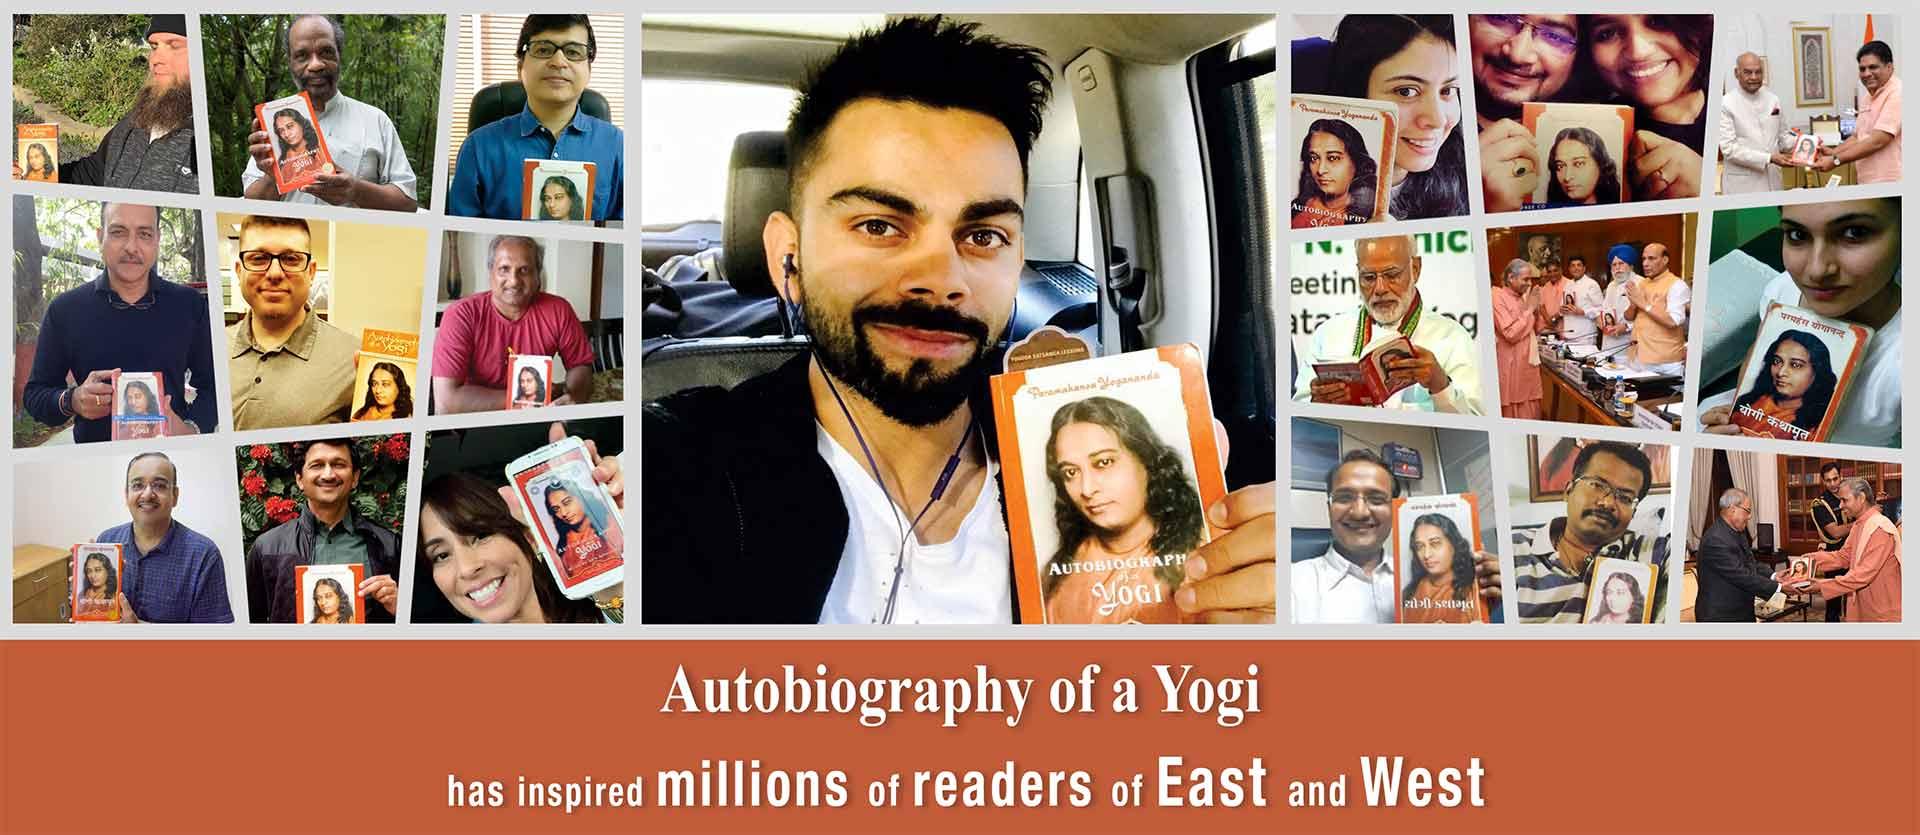 Virat Kohli, Narendra Modi, Ram Nath Kovind, Ravi Shastri and others holding the book Autobiography of a Yogi.